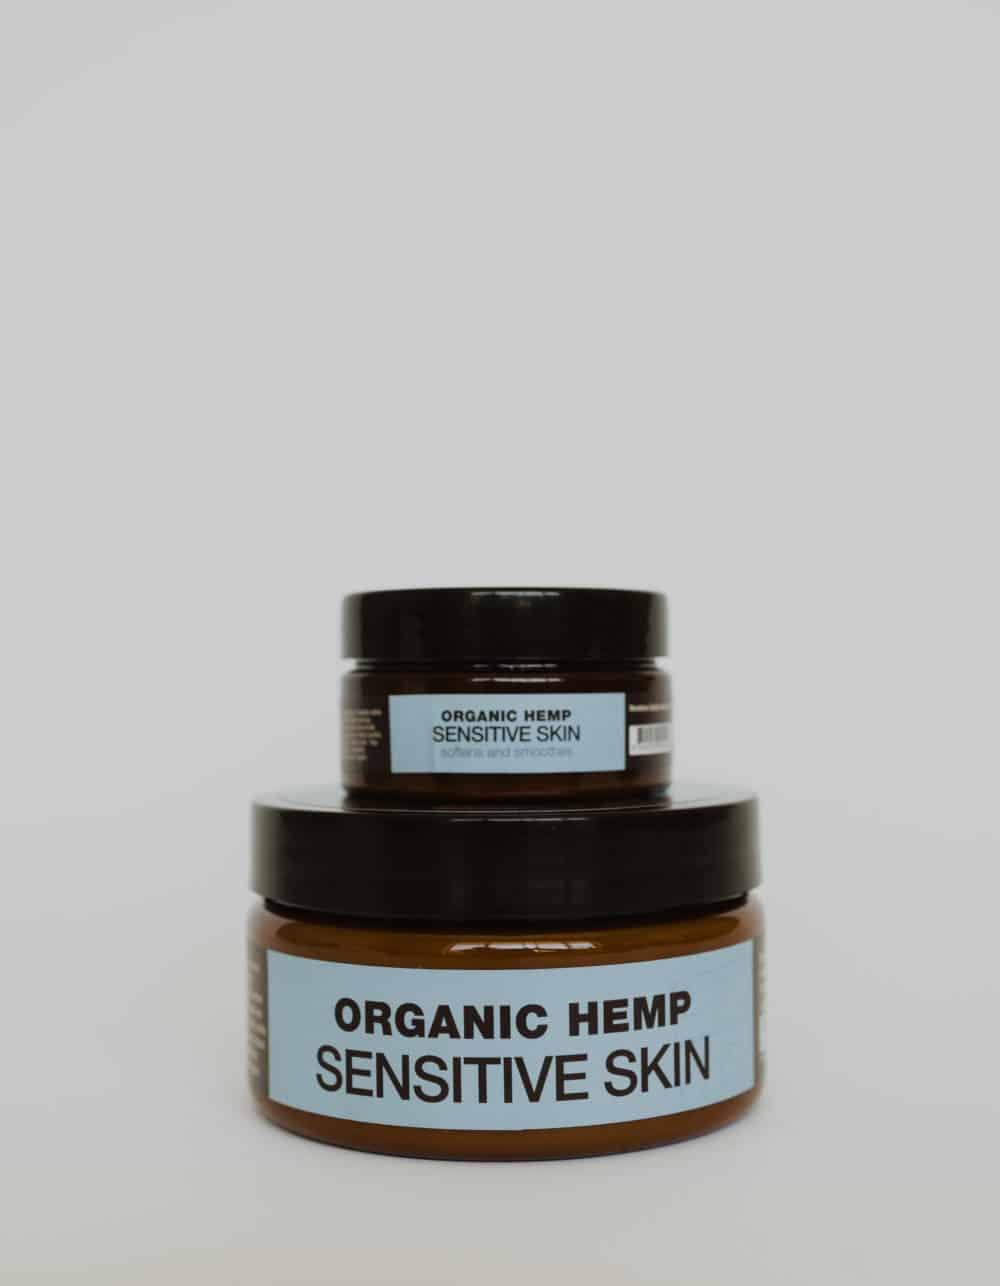 OrganicHemp Moisturiser for Sensitive Skin - 50g